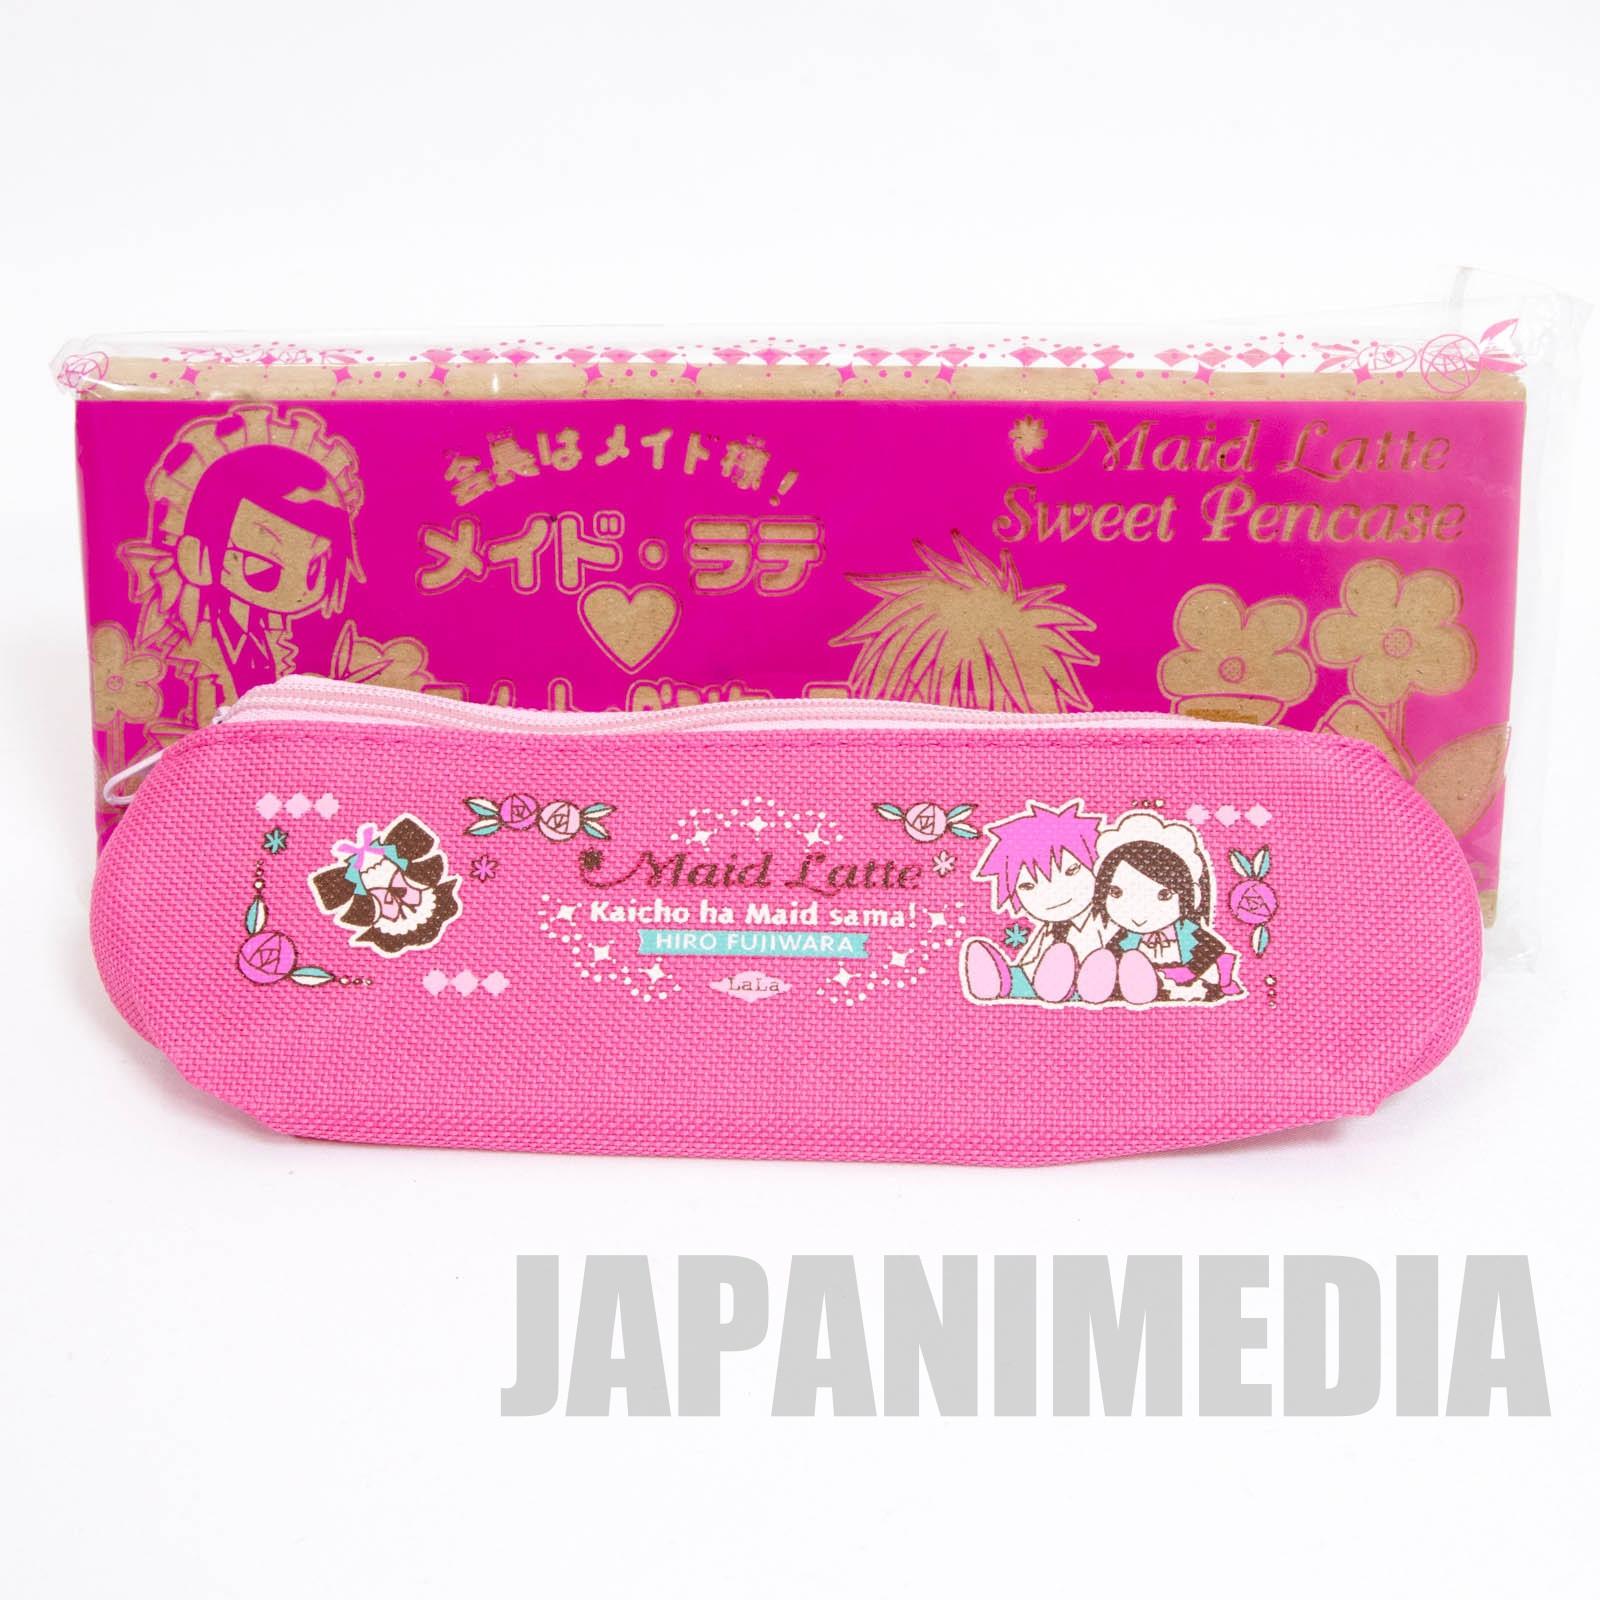 Kaichou wa Maid Sama! Maid Latte Sweet Pen case [Misaki | Usui] JAPAN MANGA